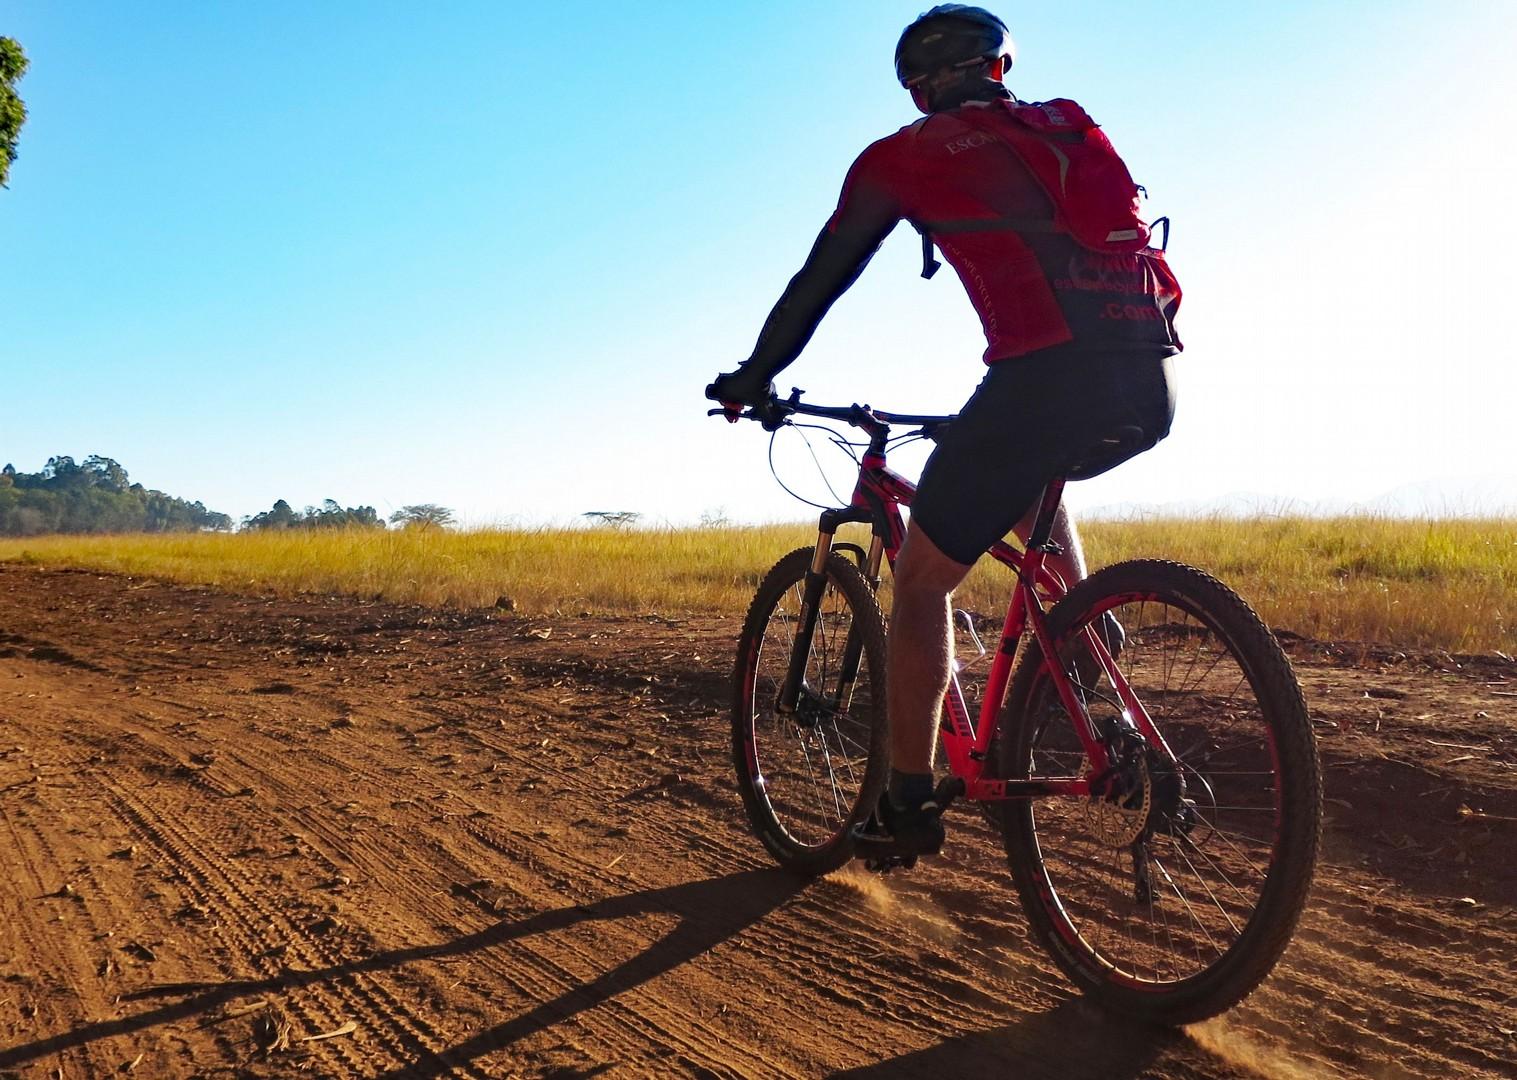 swaziland-cycling-adventure-saddle-skedaddle.jpg - Swaziland (Eswatini) - Cycling Safari - Cycling Adventures